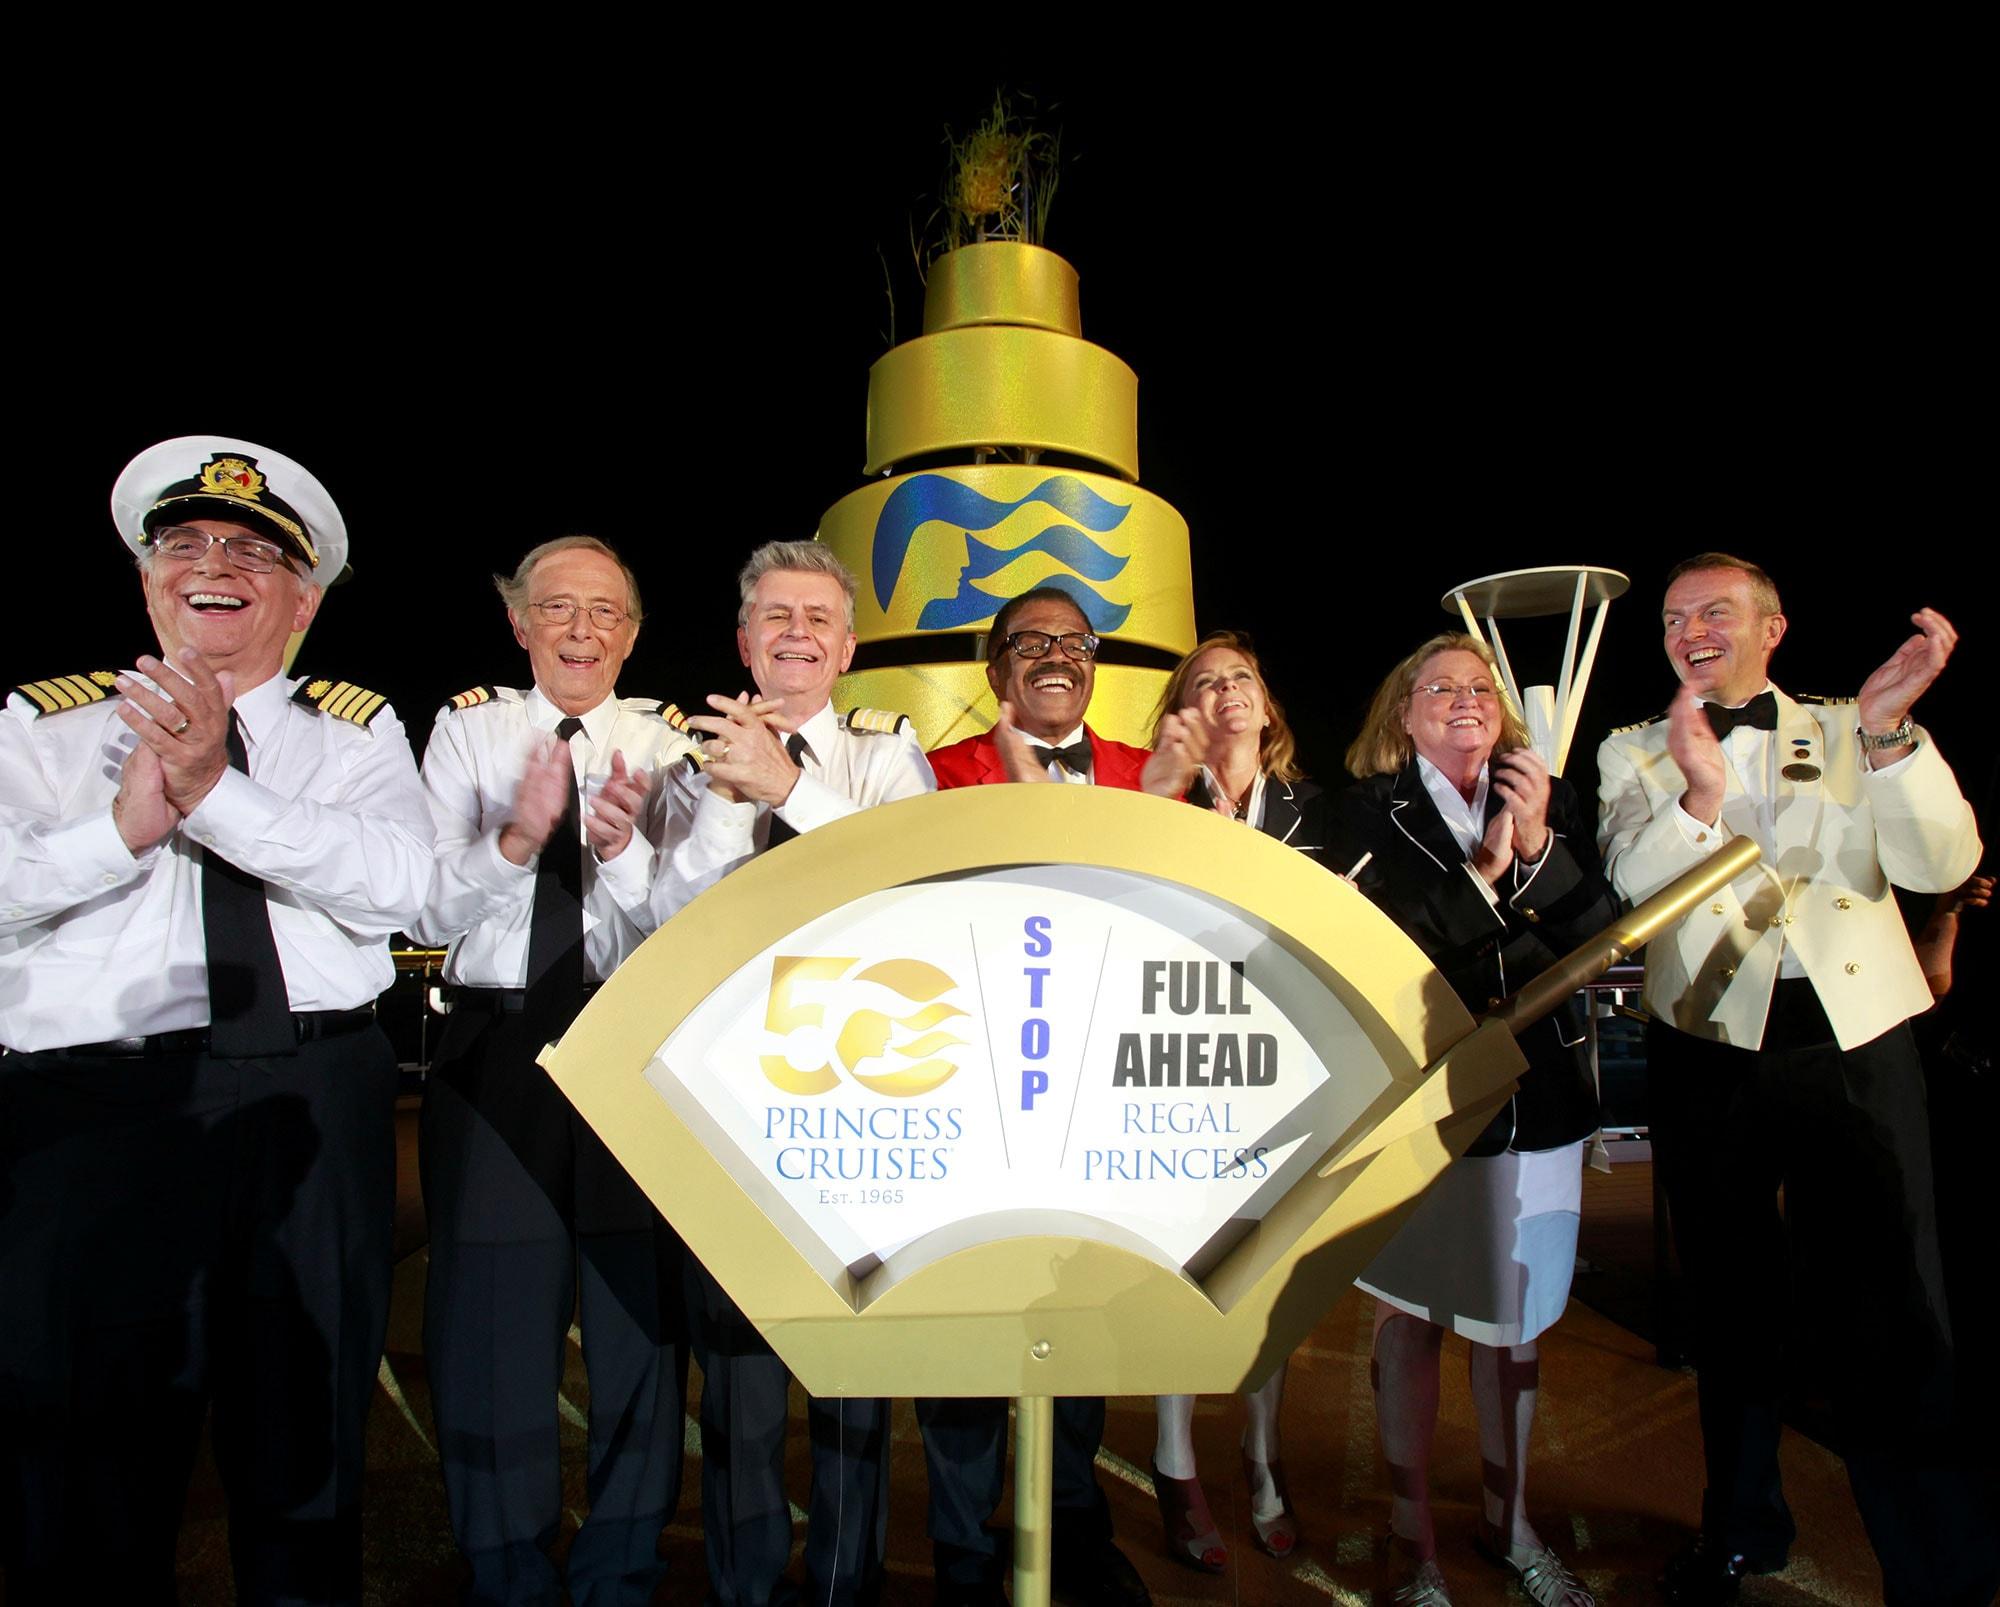 http://www.princess.com/news/images/2014/11/love-boat-cast-regal-princess-naming-lg.jpg